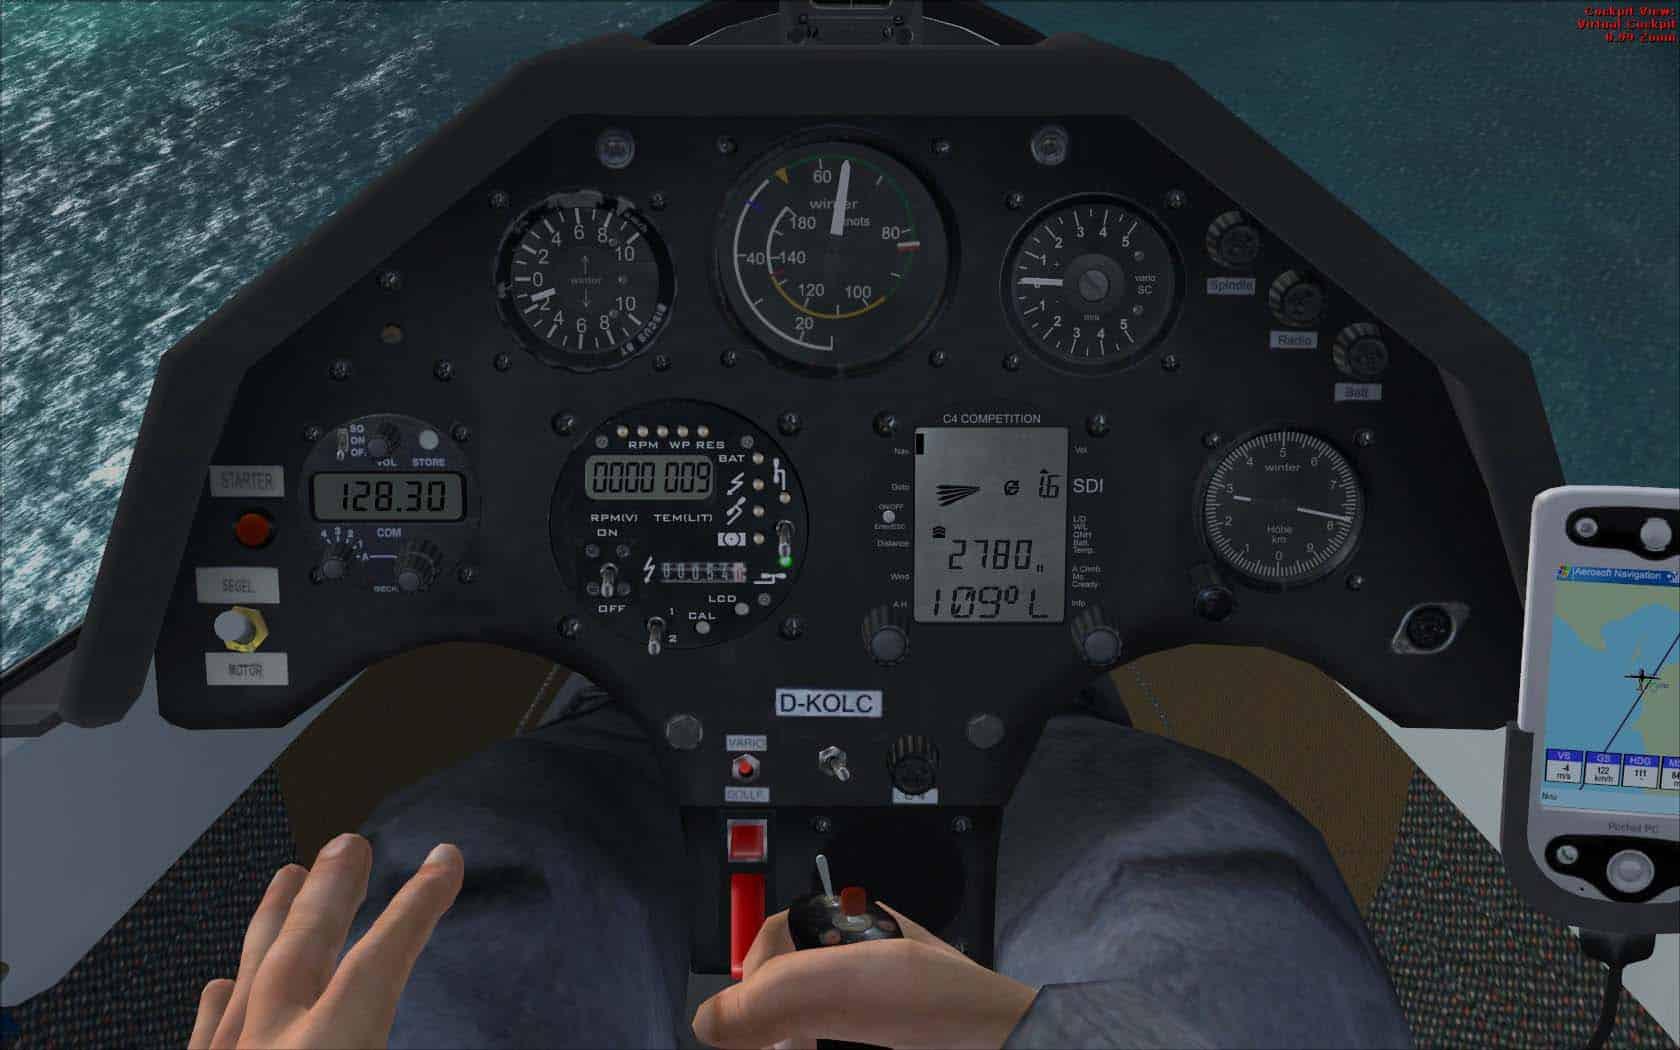 aerosoft discus glider